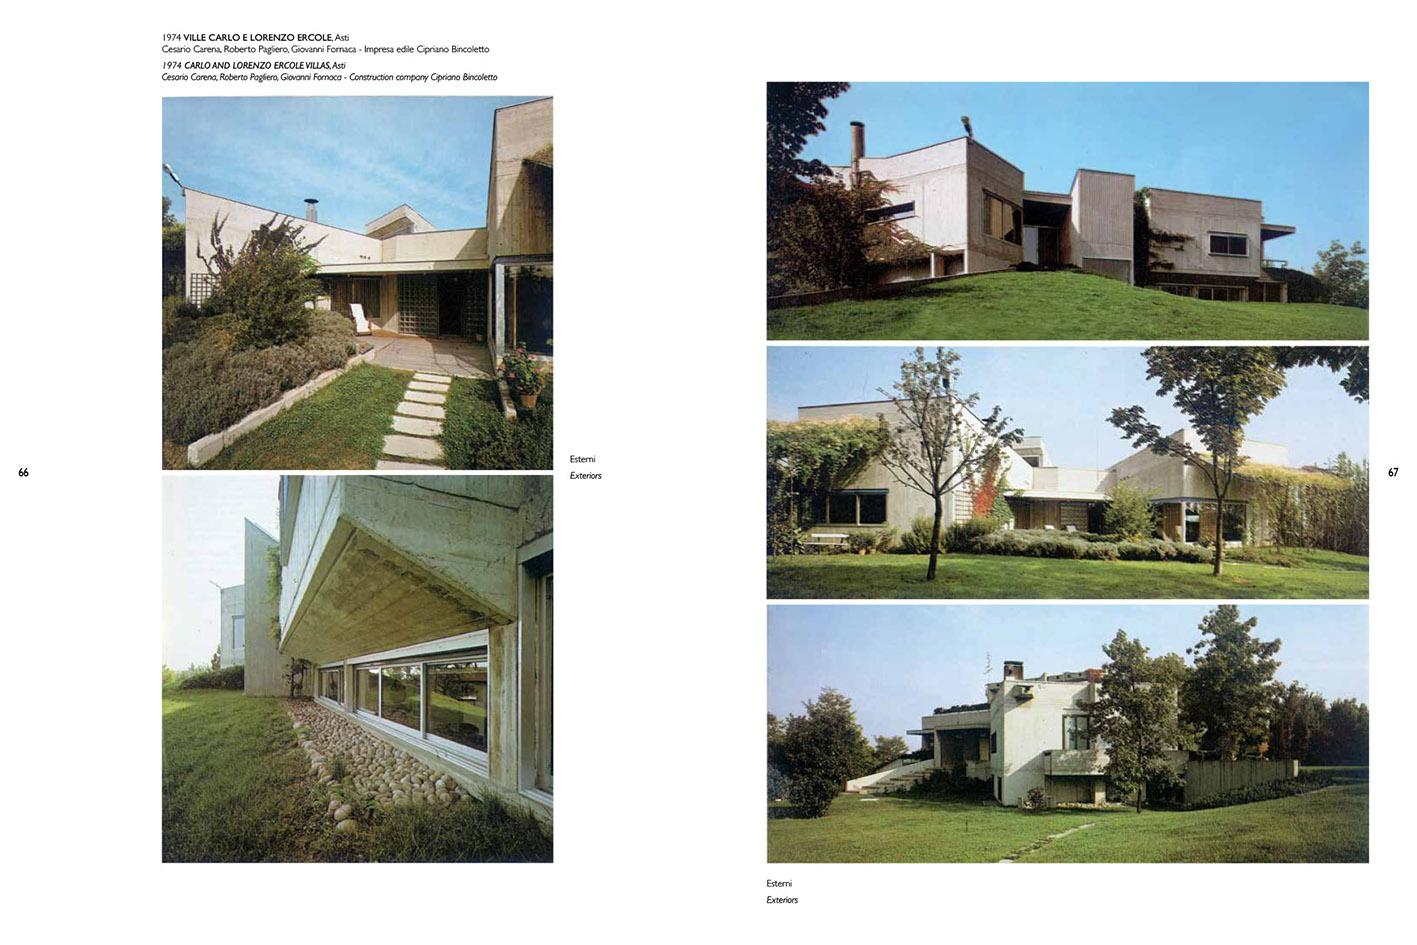 Diario Cesario Studio di Arch Torino-35 copy.jpg